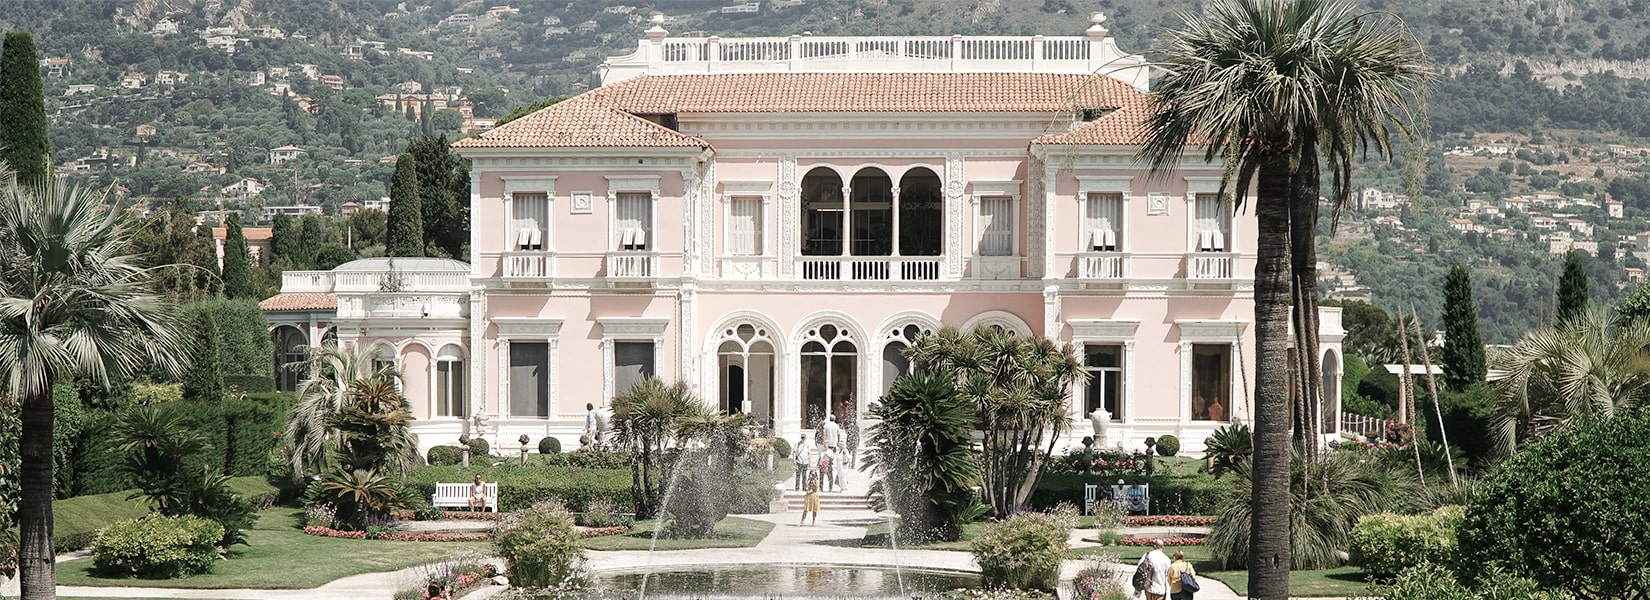 Visiting the Pink Palace – Villa Ephrussi de Rothschild